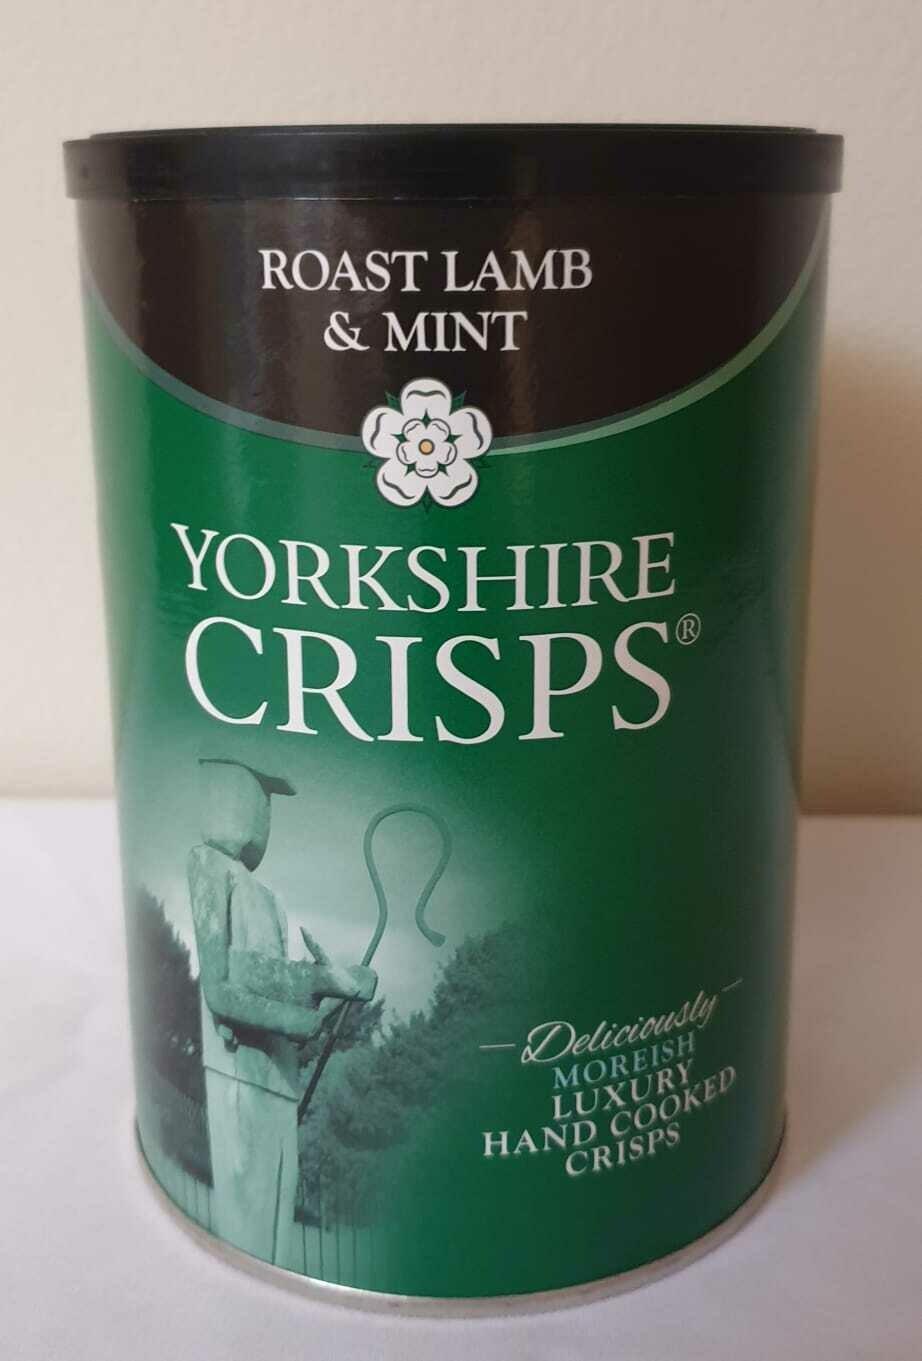 Yorkshire Crisps Roast Lamb & Mint